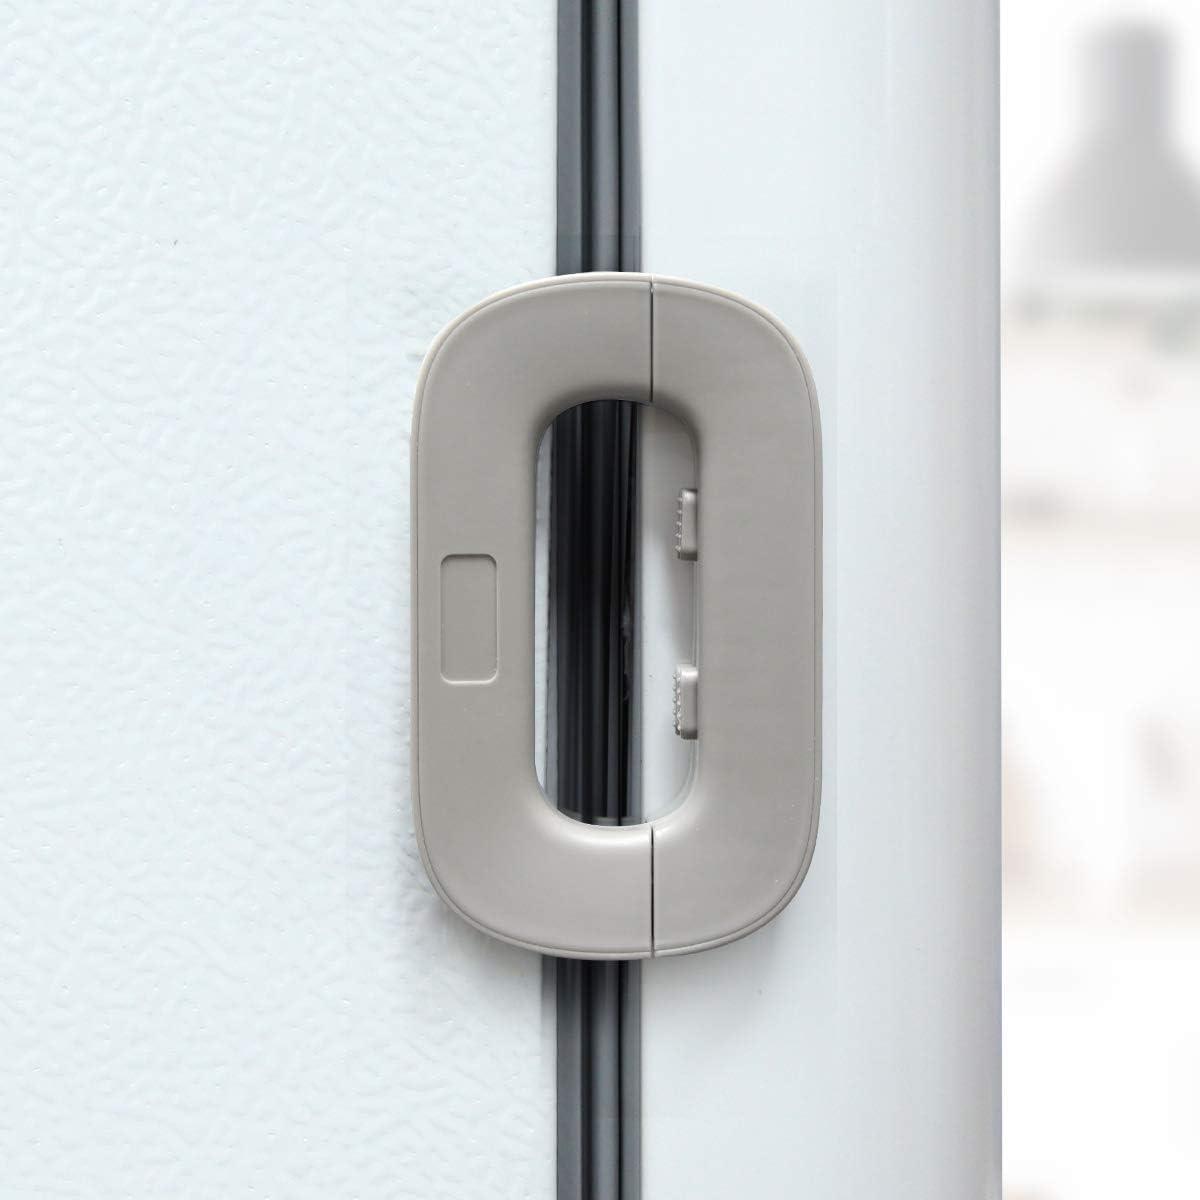 gazi Upgrade Home Refrigerator Fridge Freezer Door Lock, Latch Catch Toddler Kids Child Fridge Locks Baby Safety Child Lock, Easy to Install and Use 3M VHB Adhesive no Tools Need or Drill